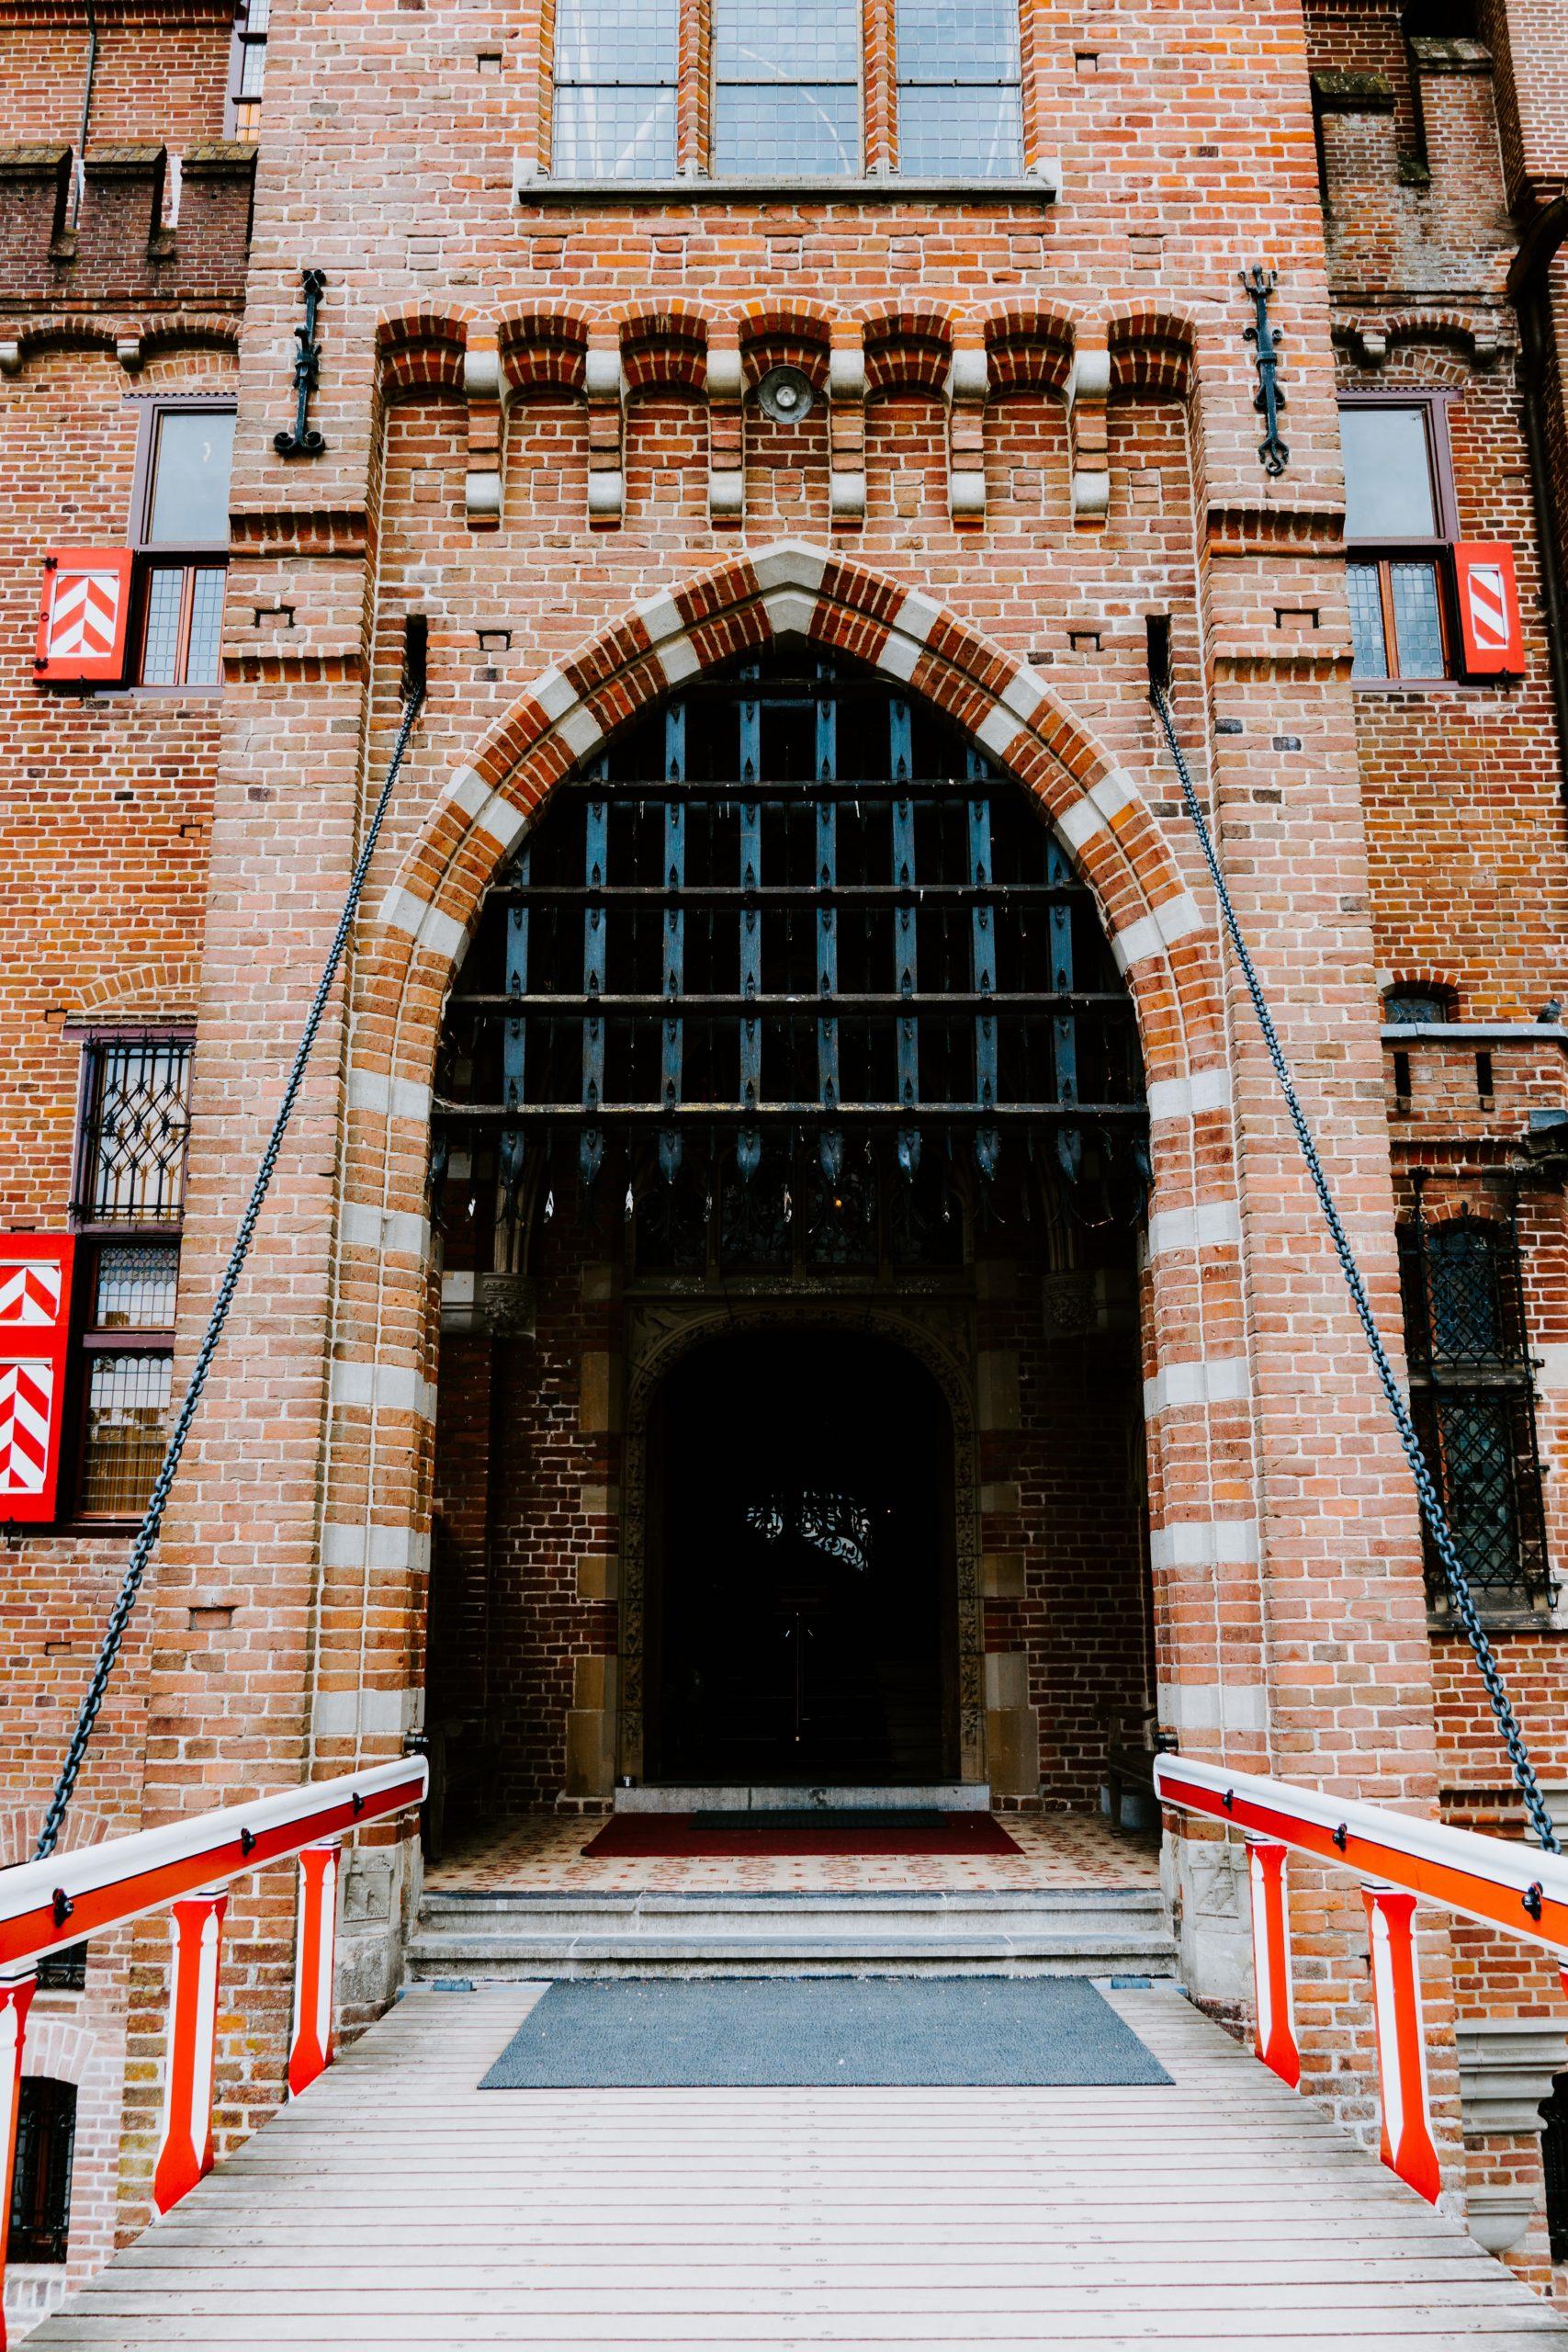 Castles in Utrecht, www.roadsanddestinations.com